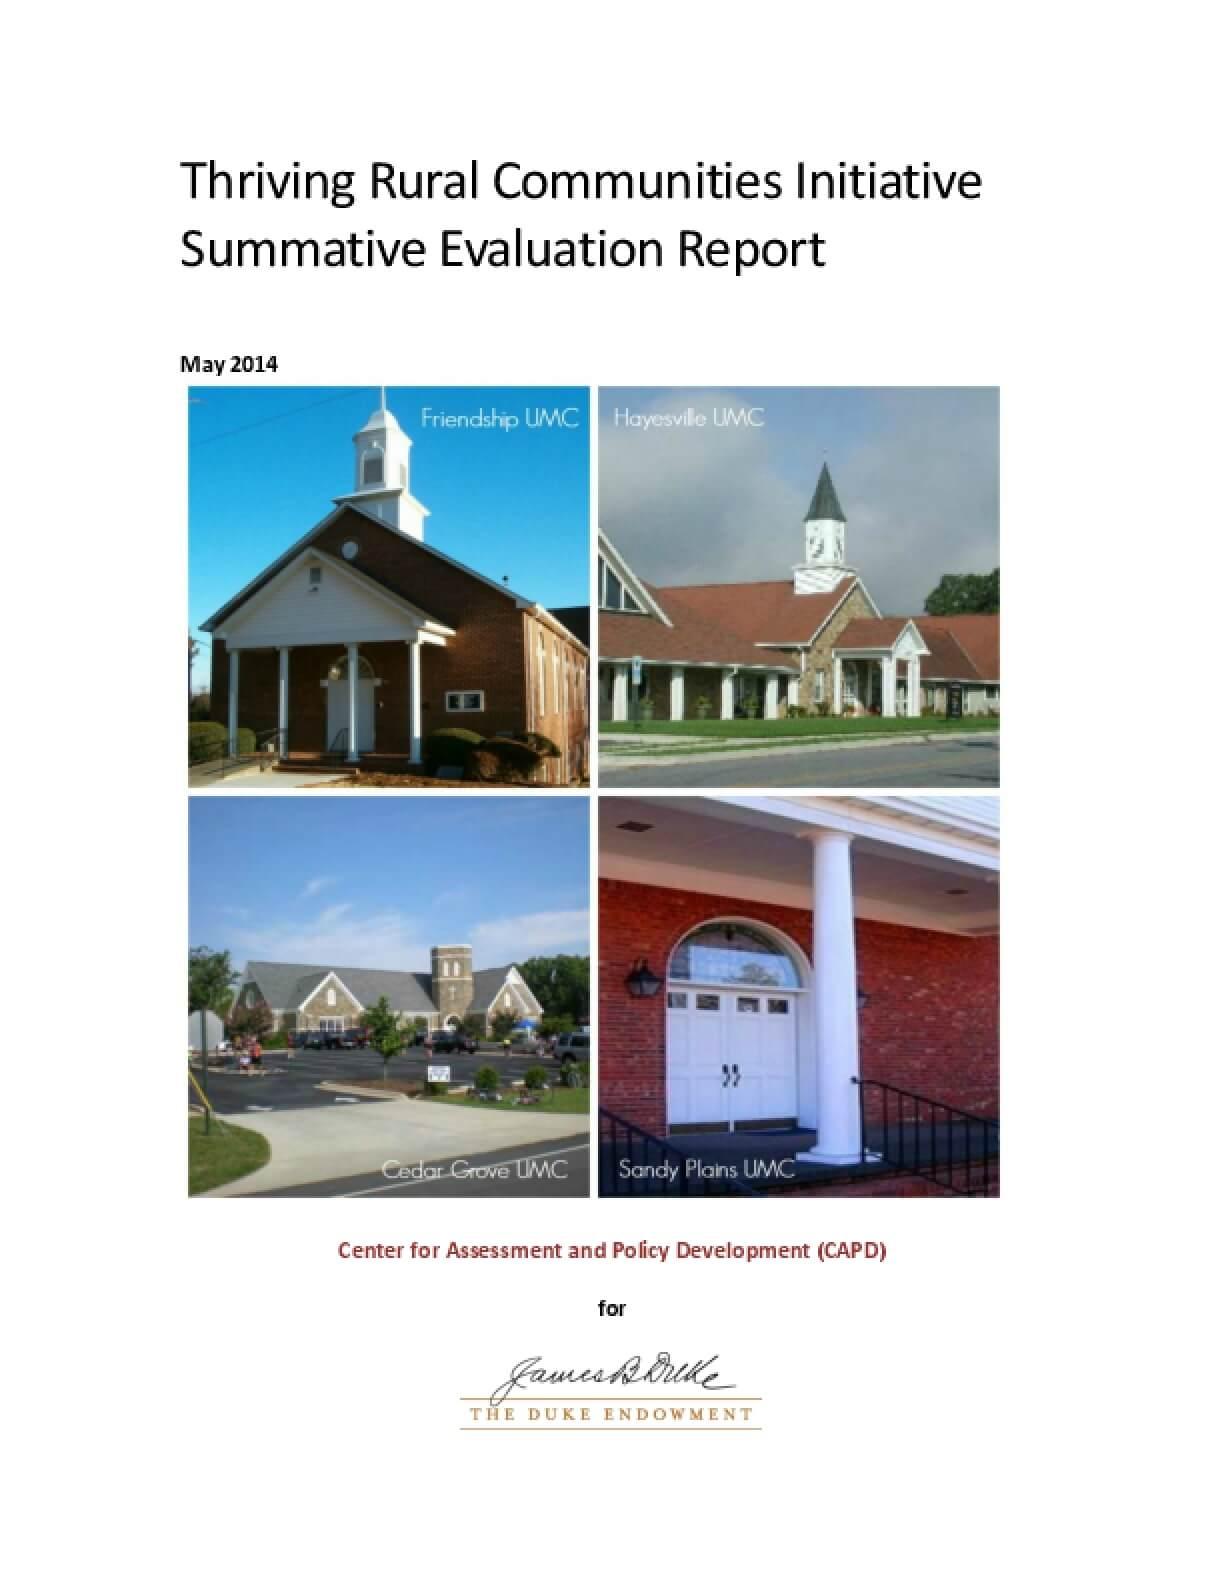 Thriving Rural Communities Initiative Summative Evaluation Report